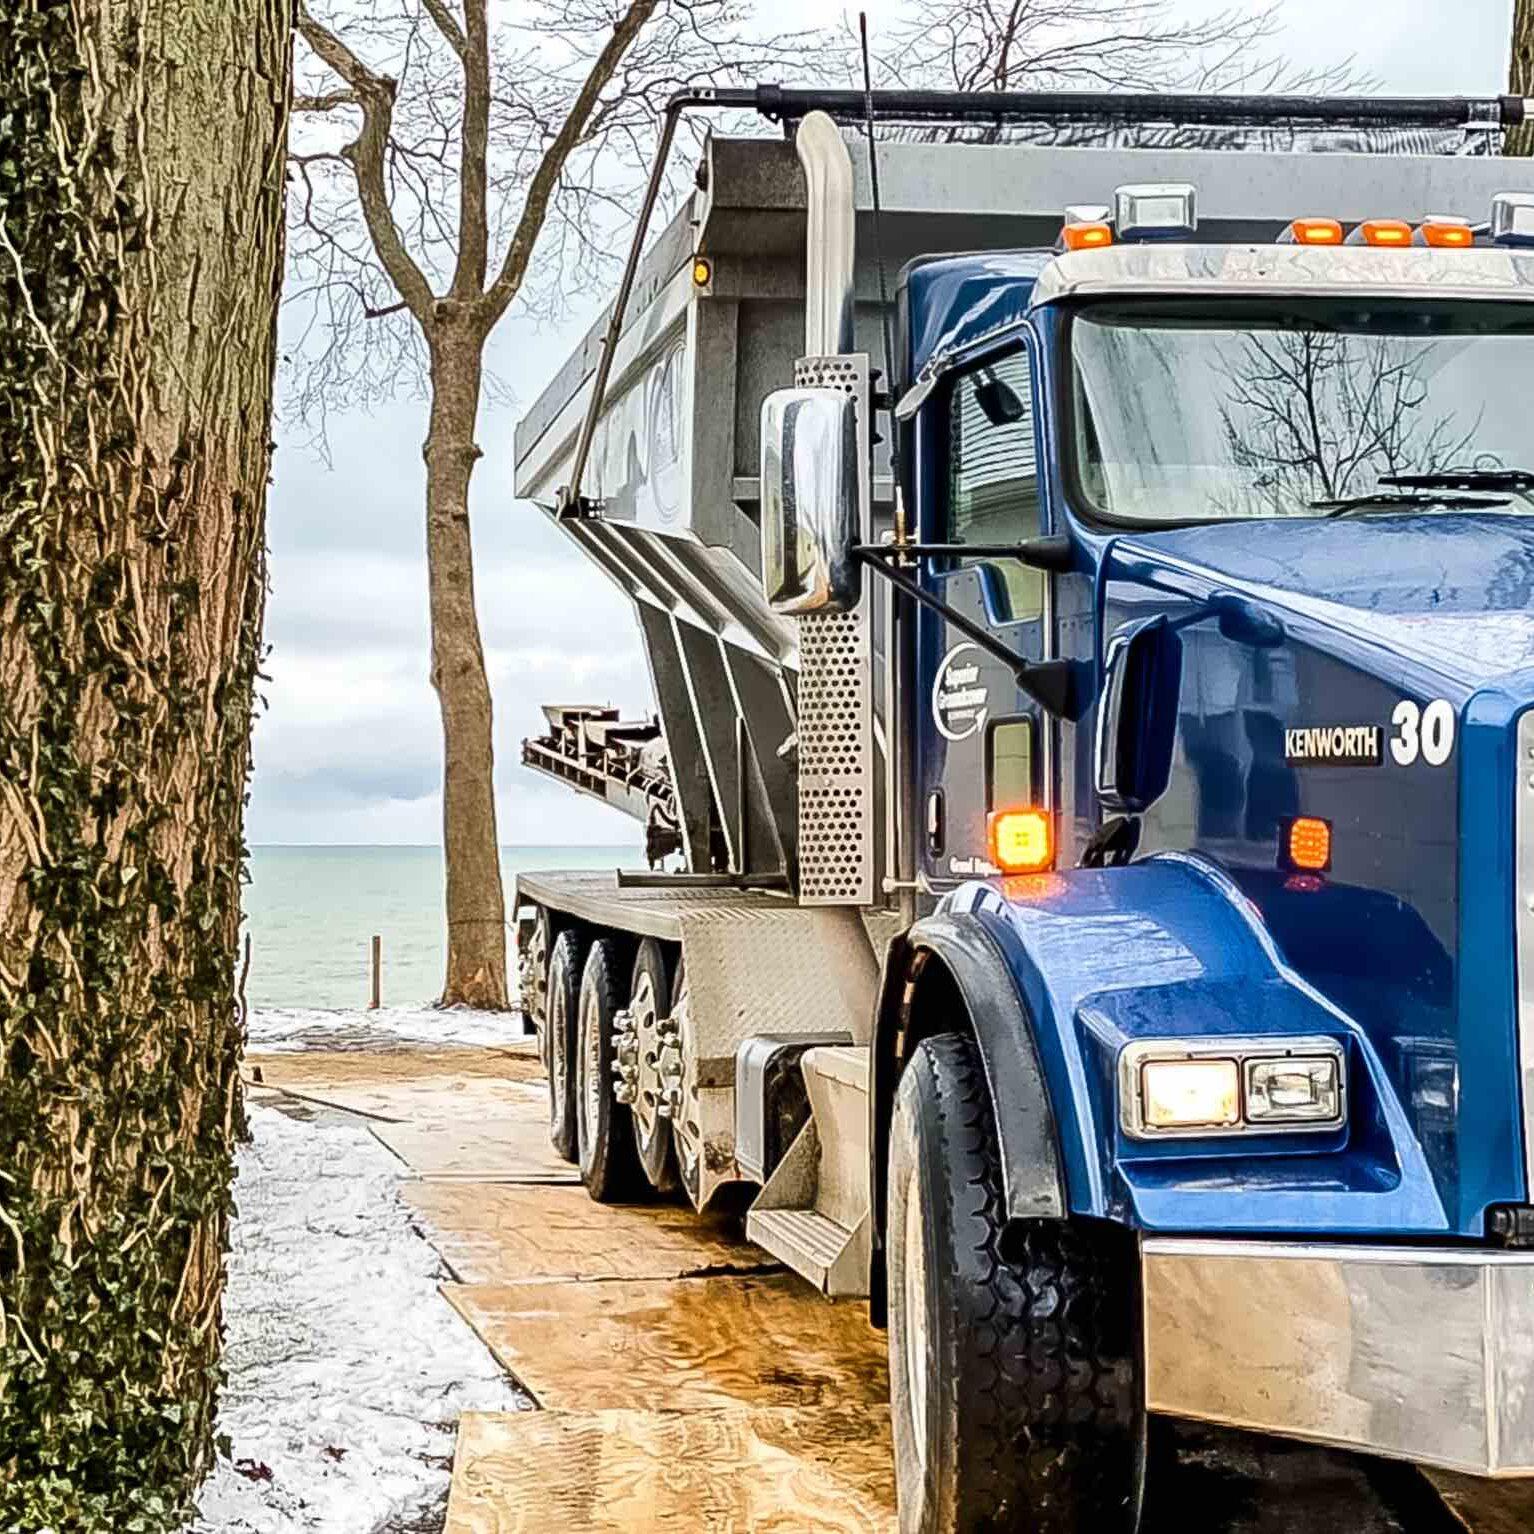 Superior stone slinger truck conveying sand